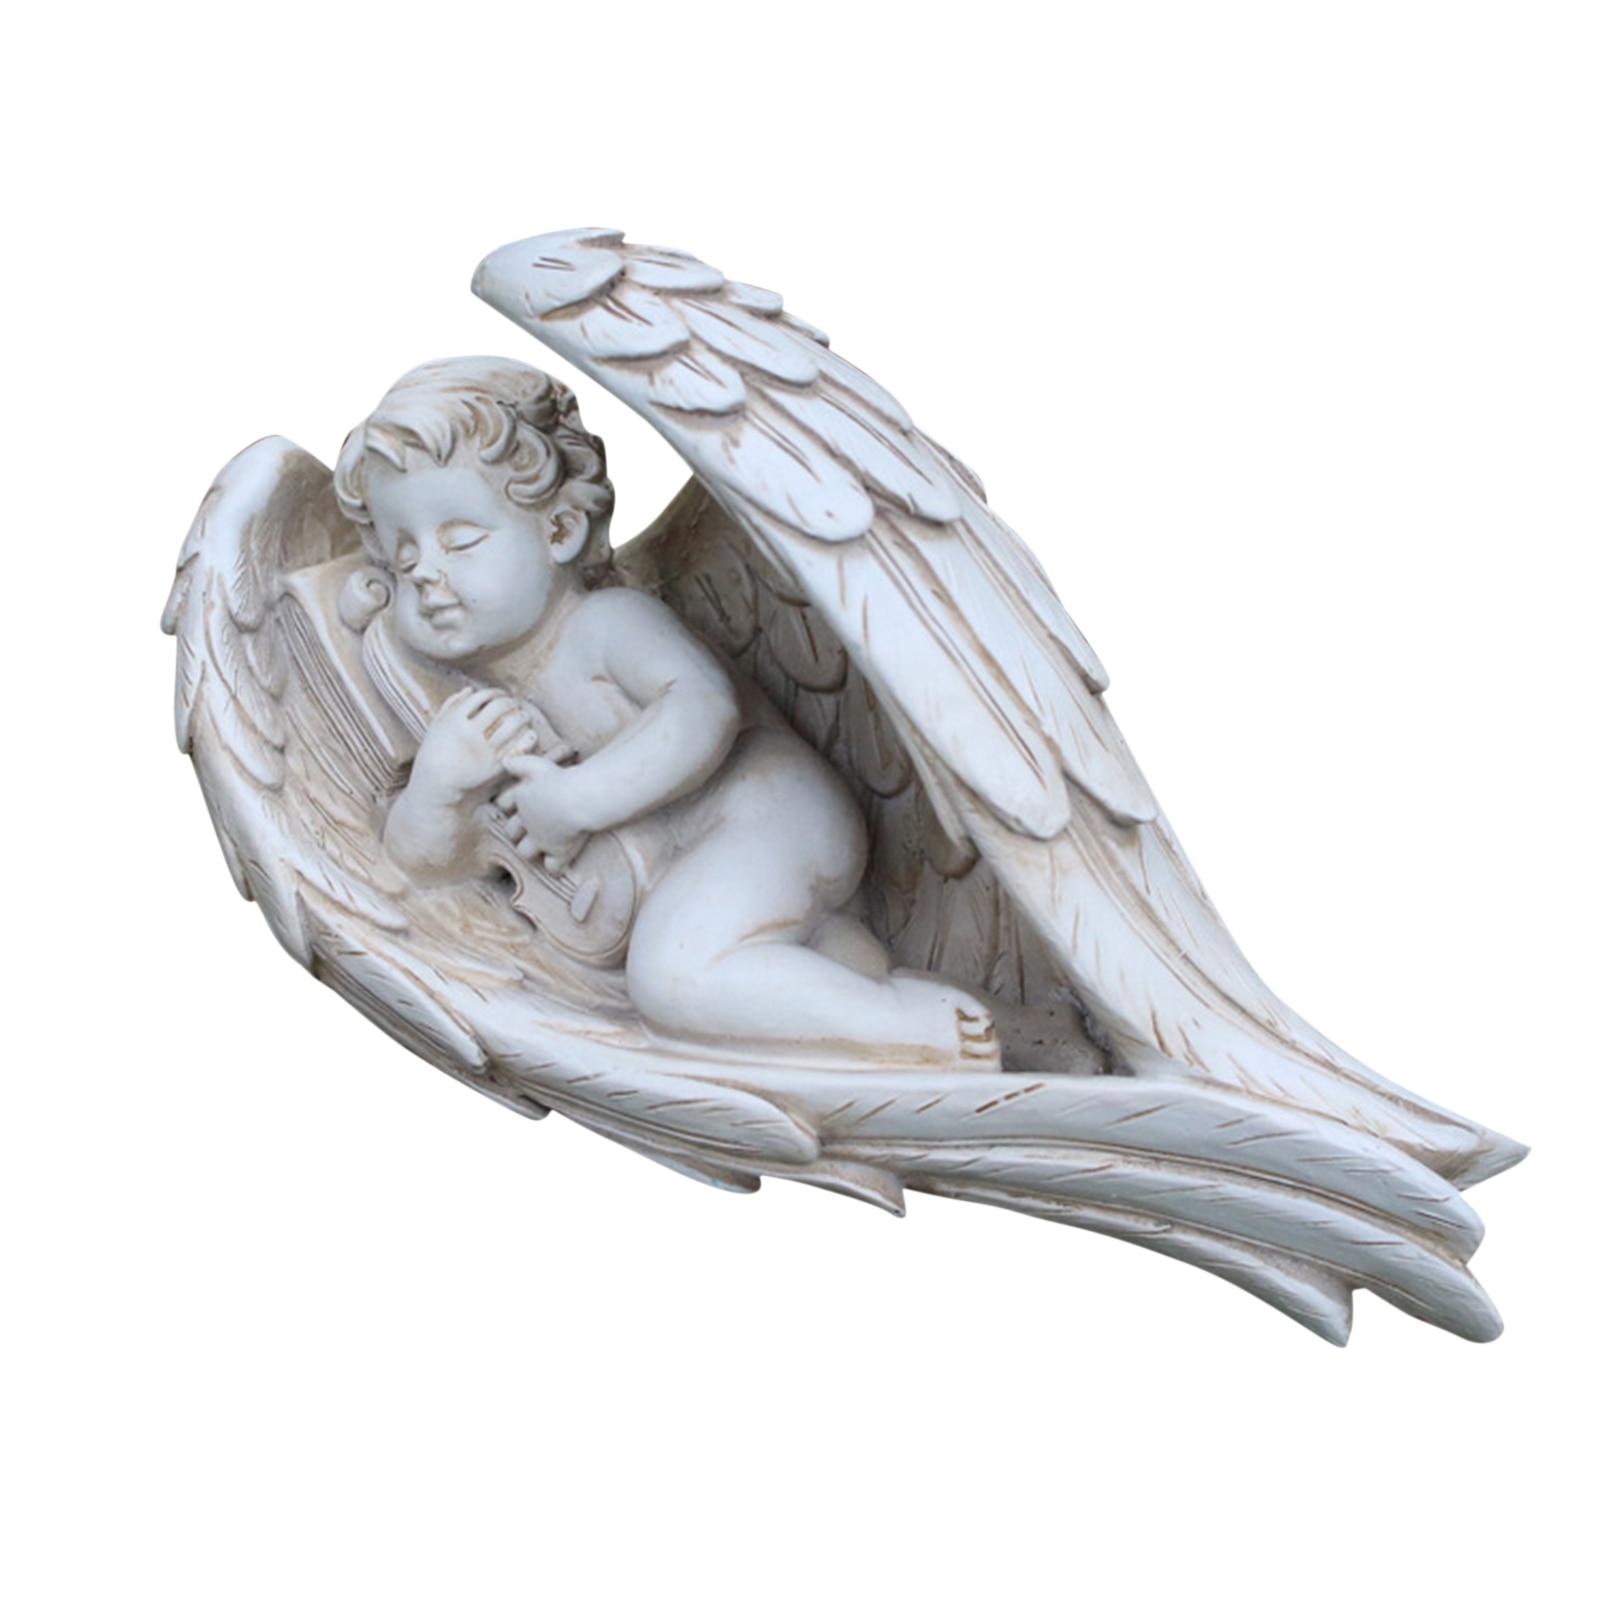 Resin Angel Boy Resin Craft Ornament Art Statue Indoor Living room Garden Lawn Decor Figurines Decoration Villa Park Sculpture